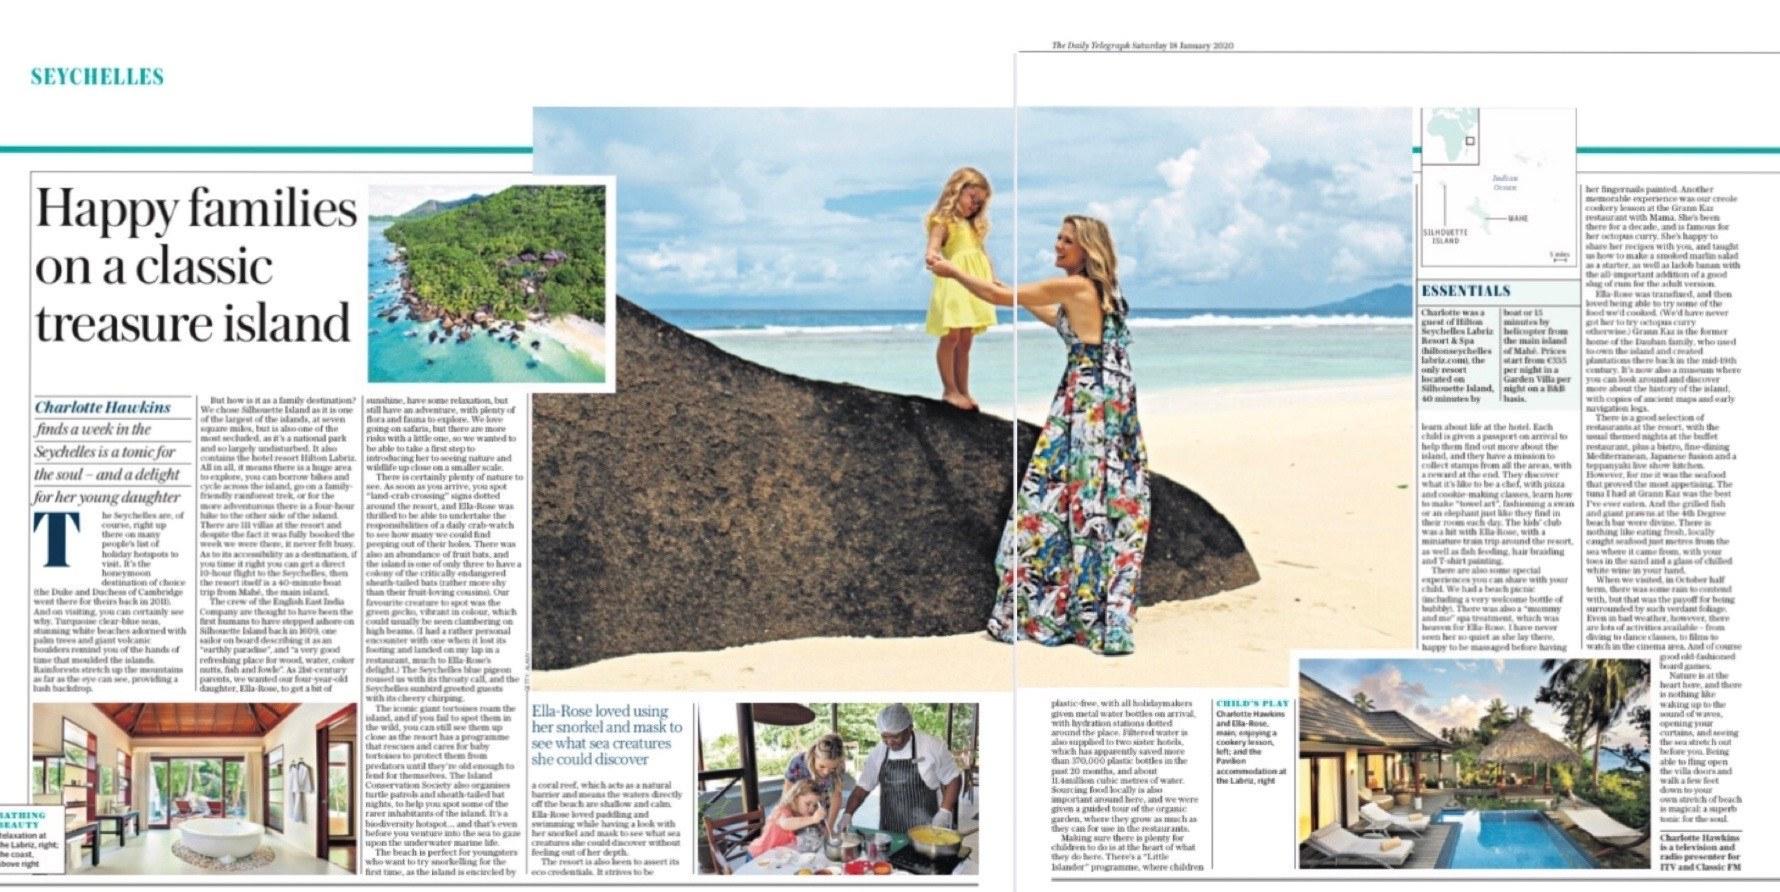 Seychelles-article-cropped.jpg#asset:567